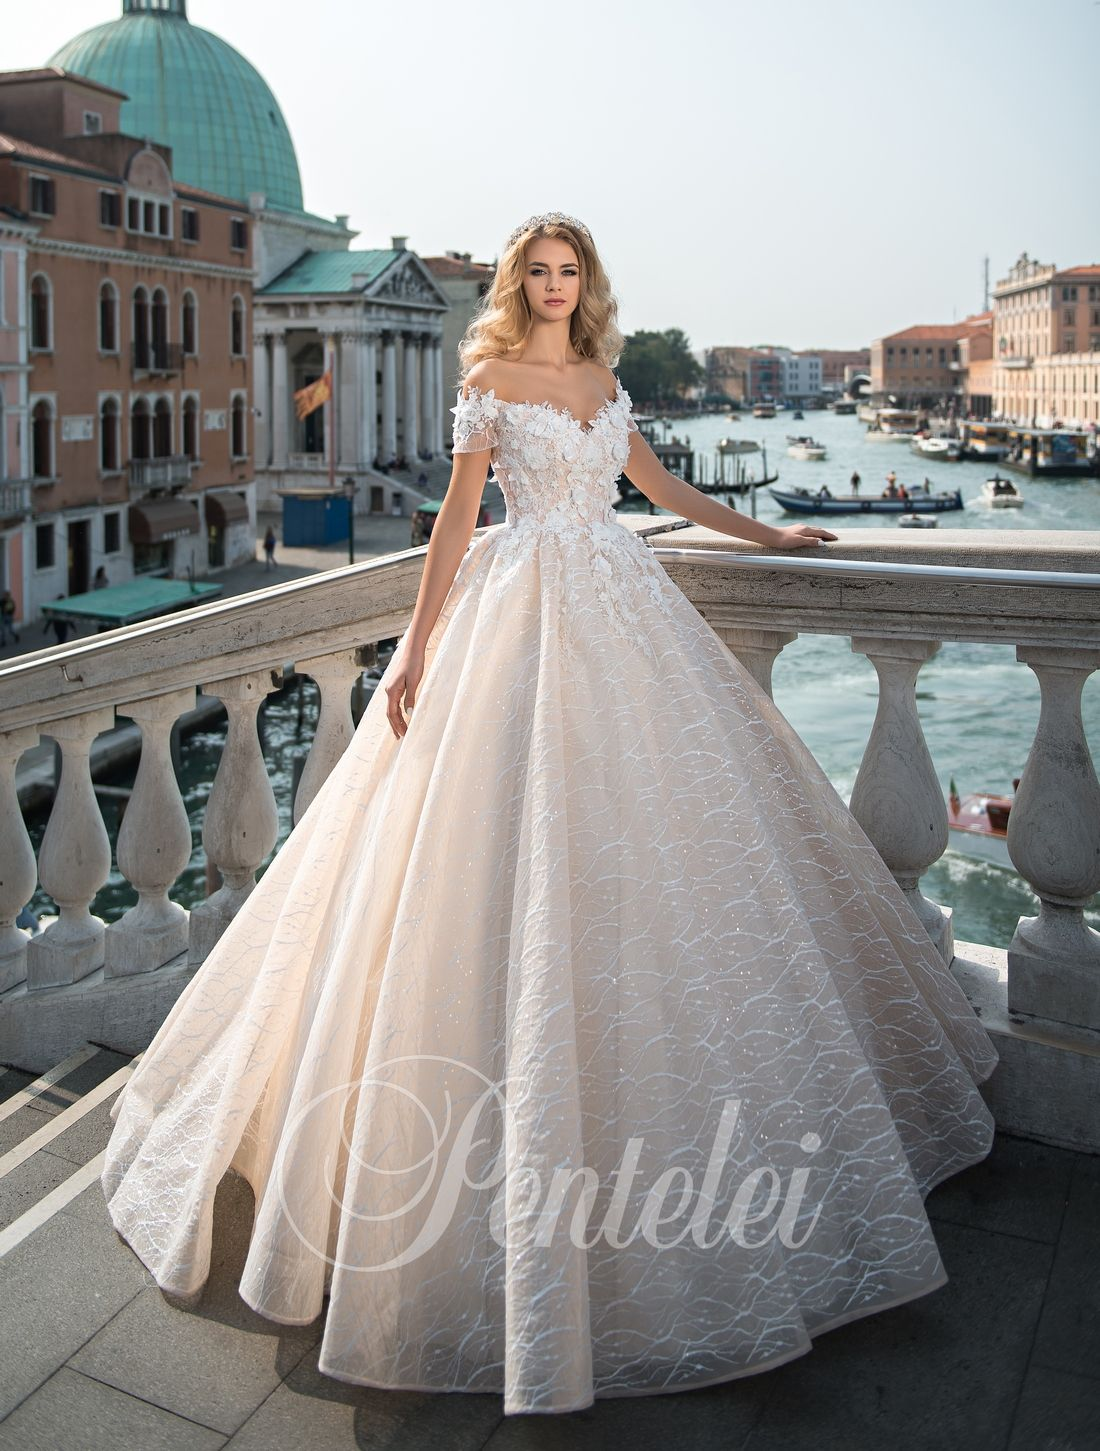 2222 Buy Wholesale Wedding Dresses From Pentelei: Ever Buying Wholesale Wedding Dresses At Reisefeber.org